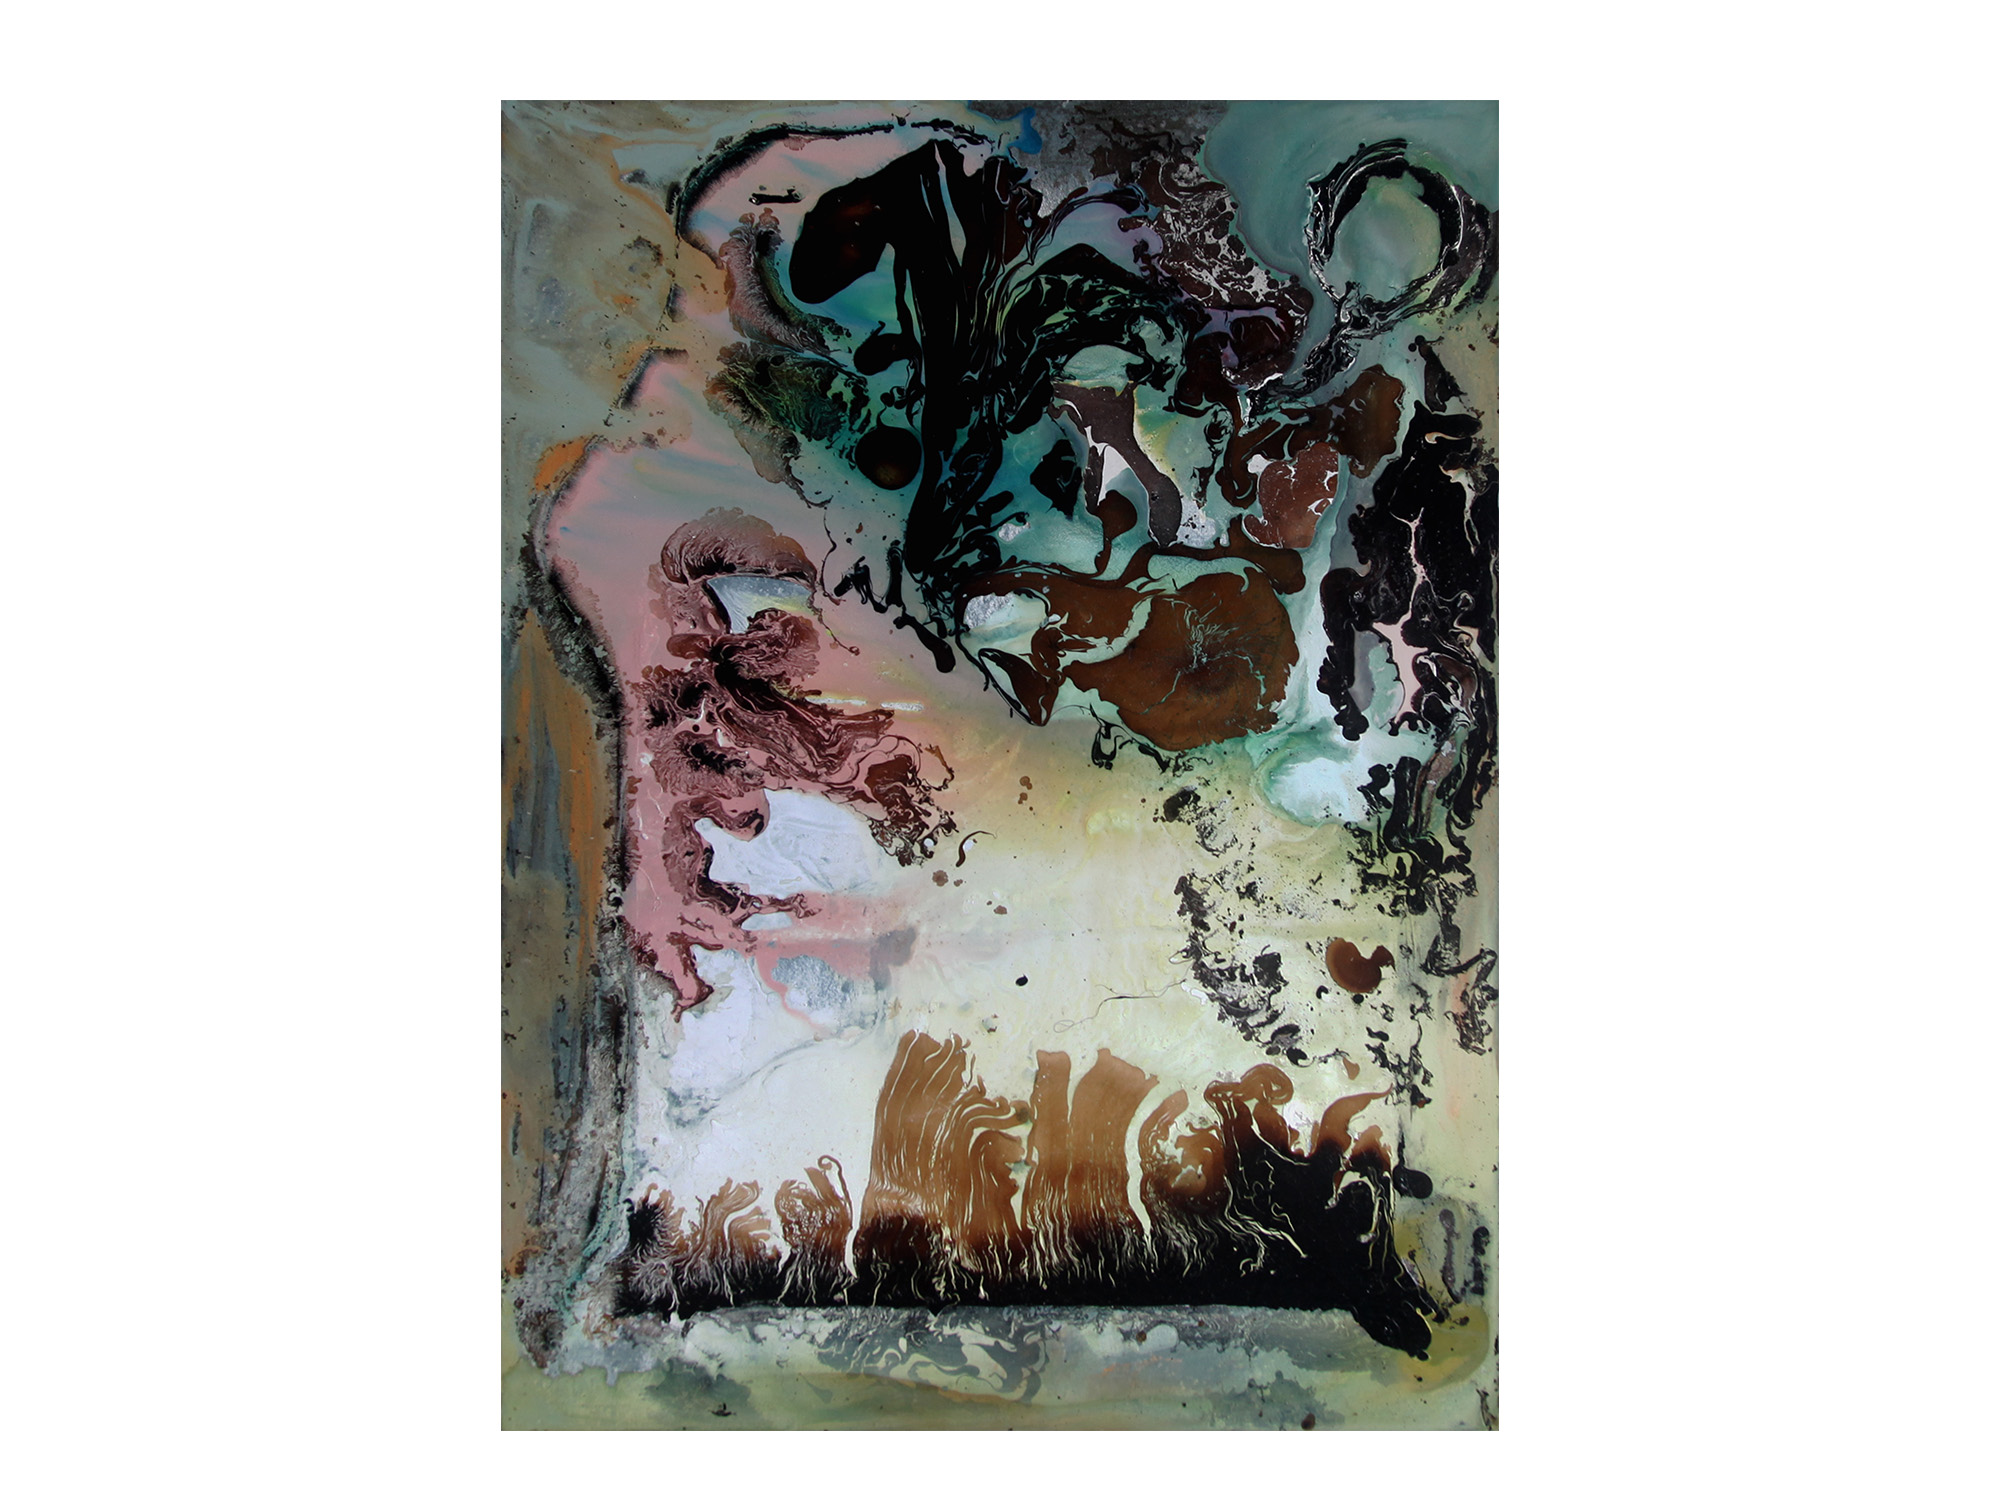 Eduardo Santos   Memories of Colours IX , 2018 oil, acrylic and natural pigment on canvas mounted on board 130 x 90cm   ARTIST BIO